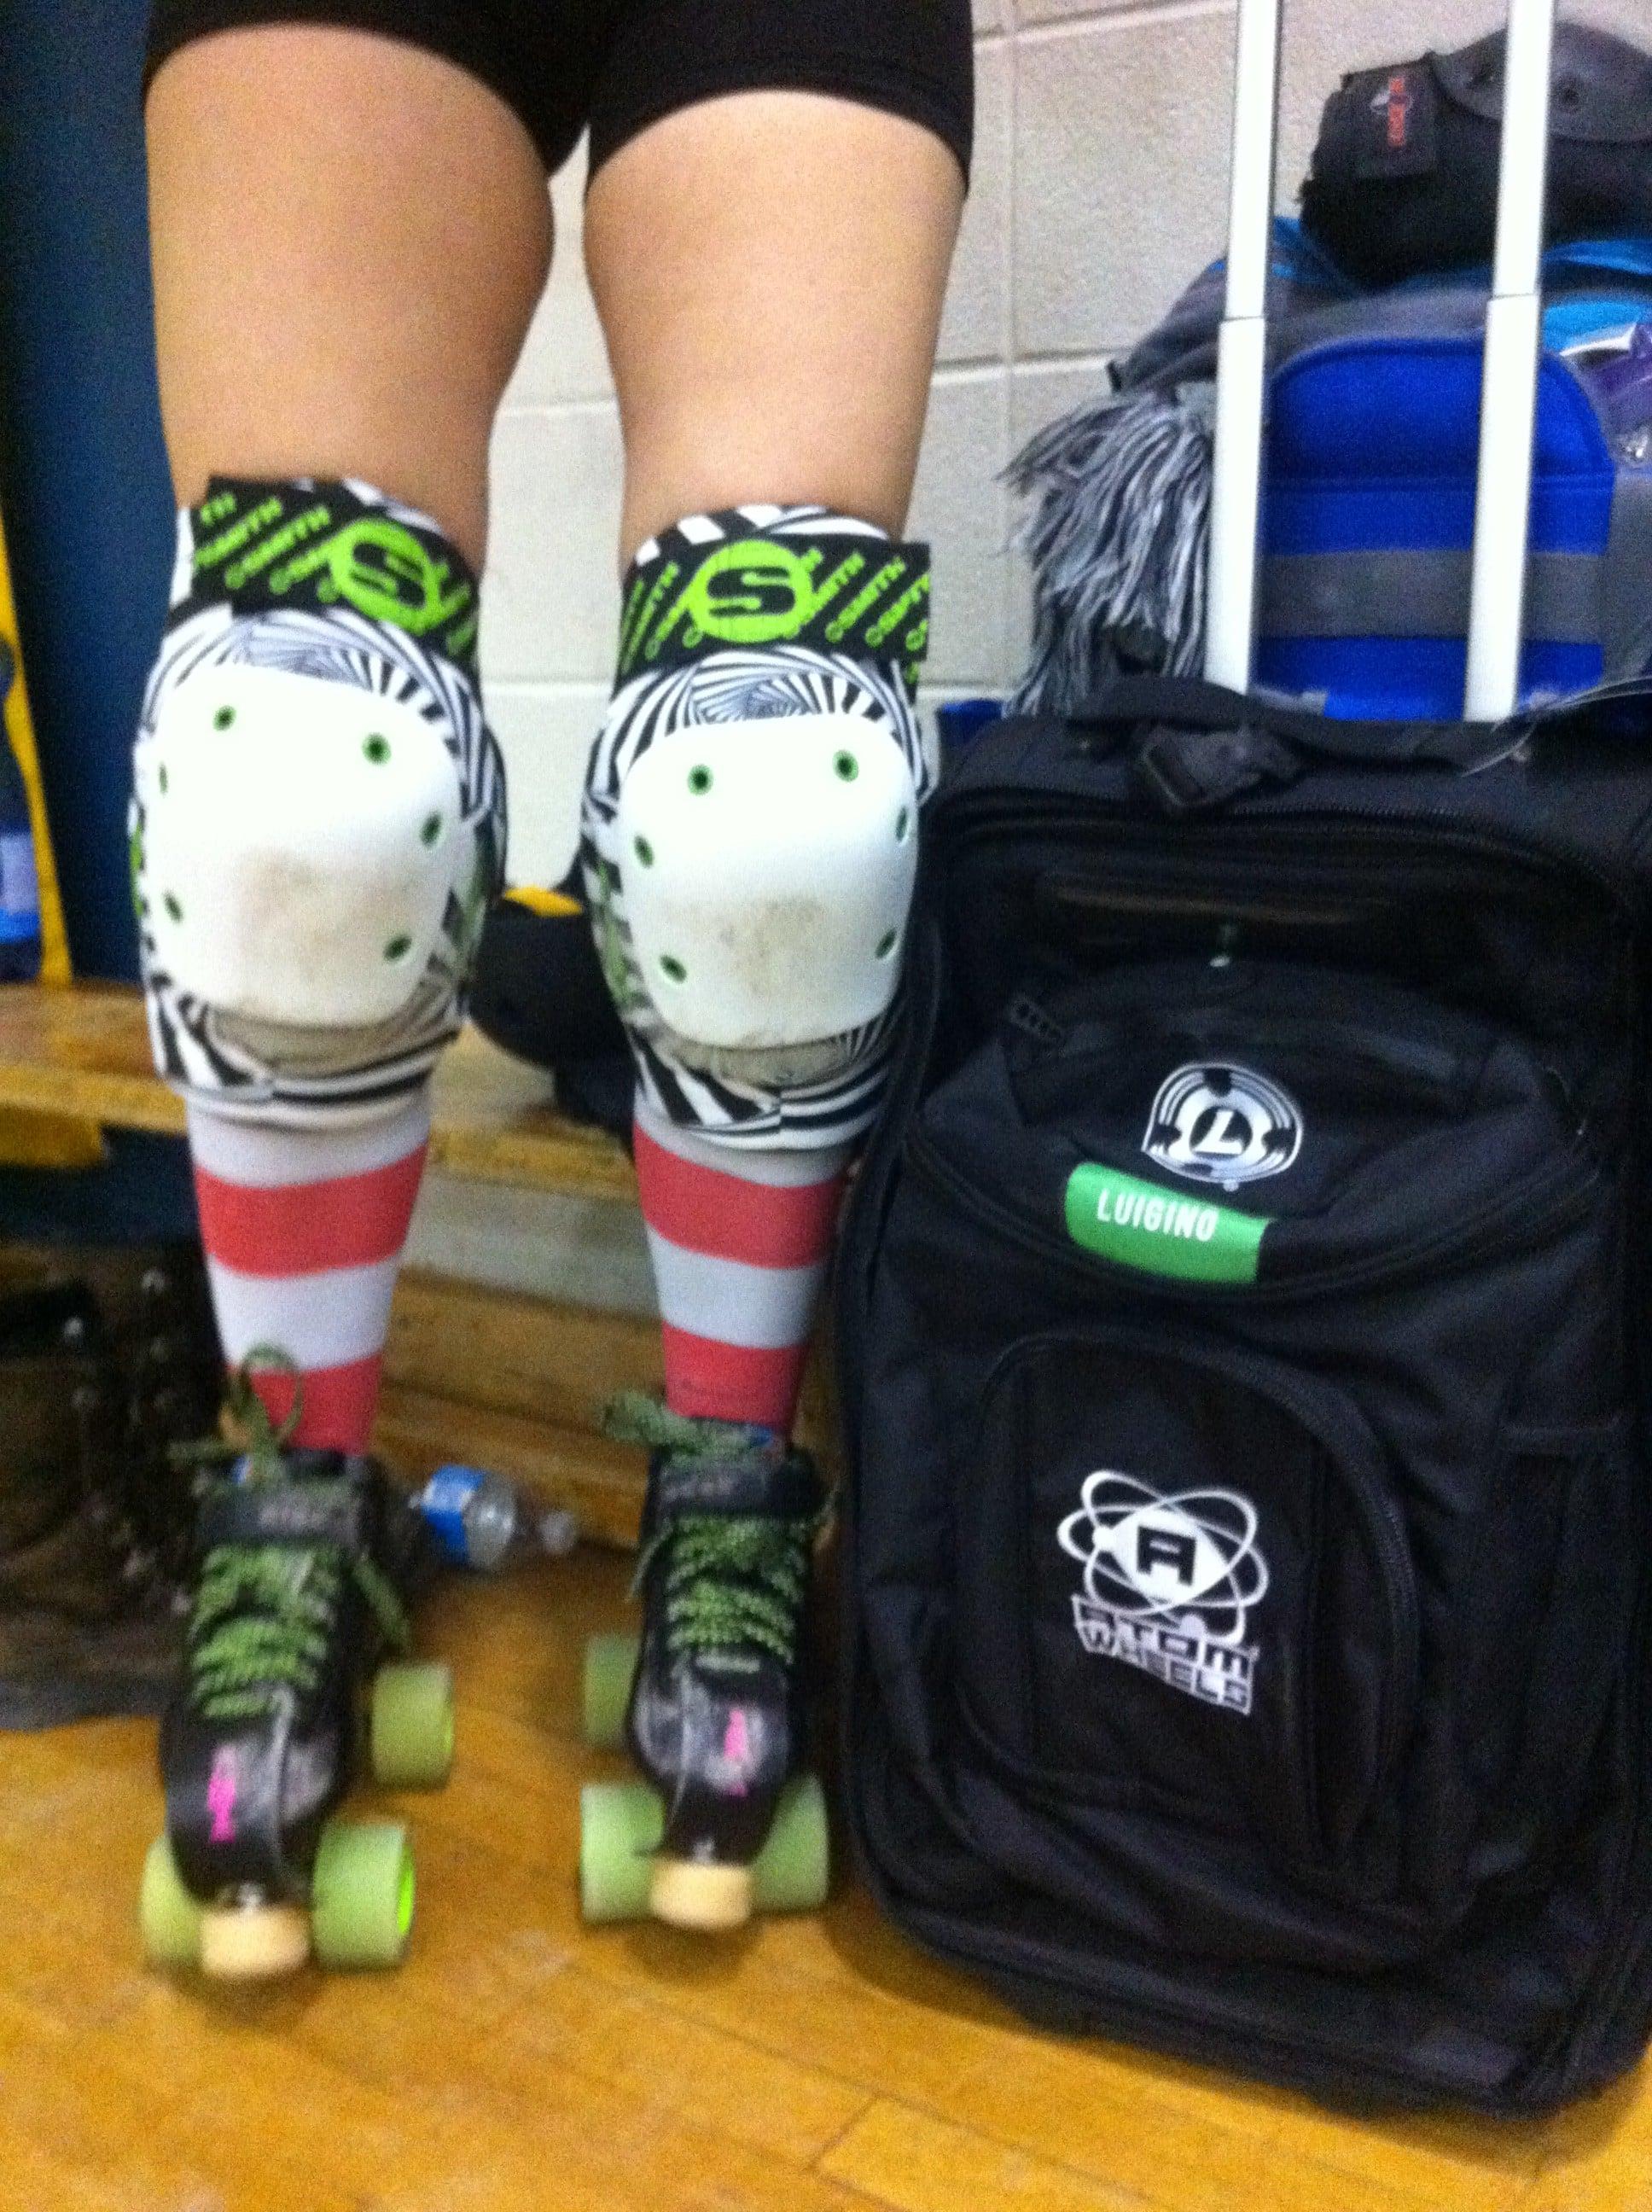 Knee pads & bag